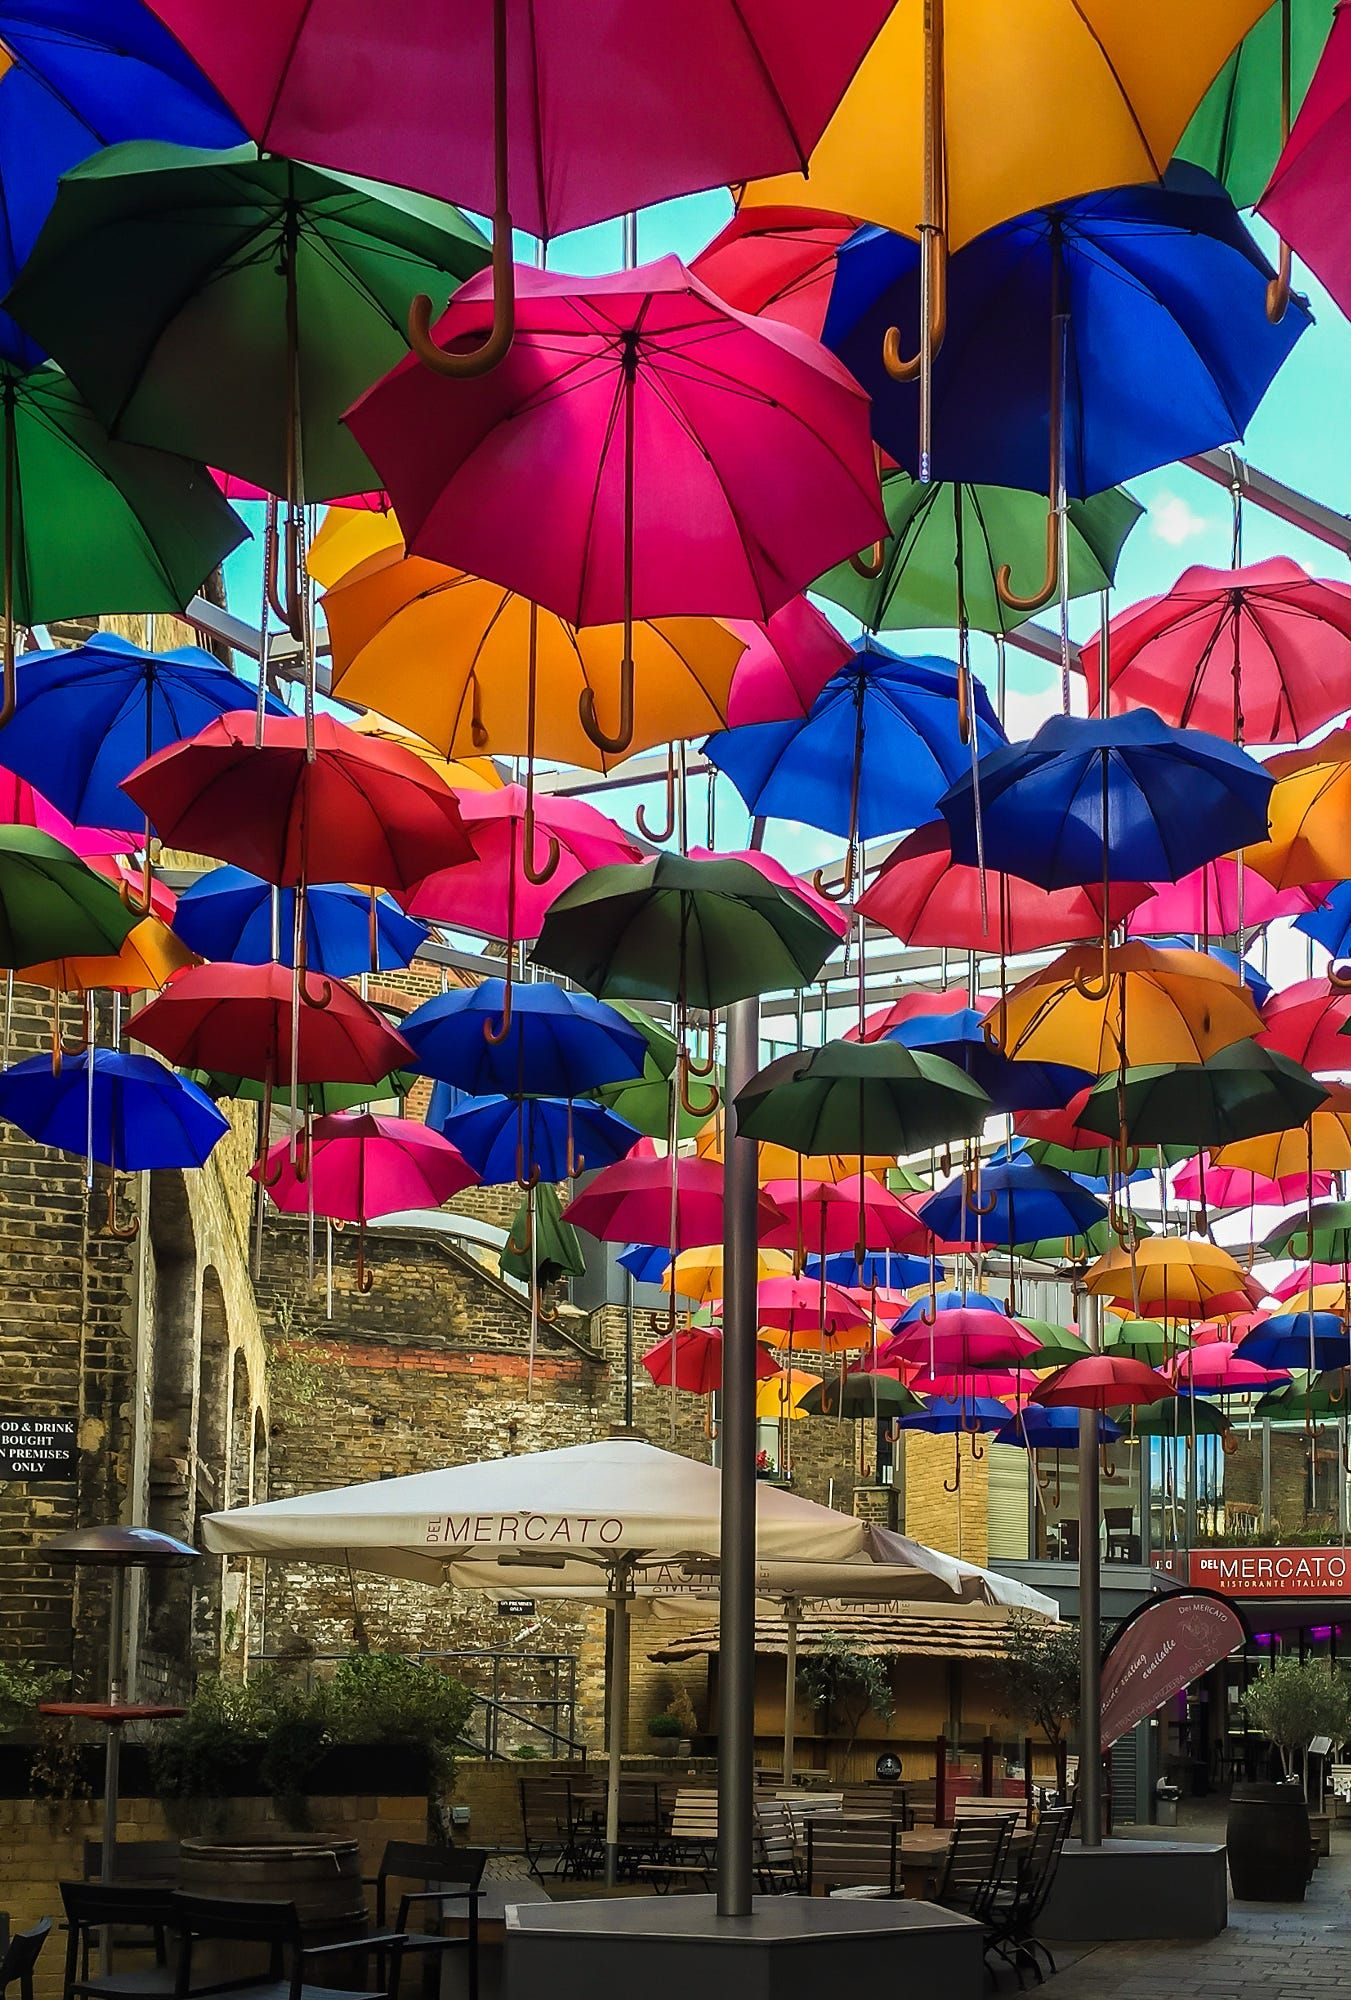 Colourful display of suspended umbrellas near Borough Market, London.